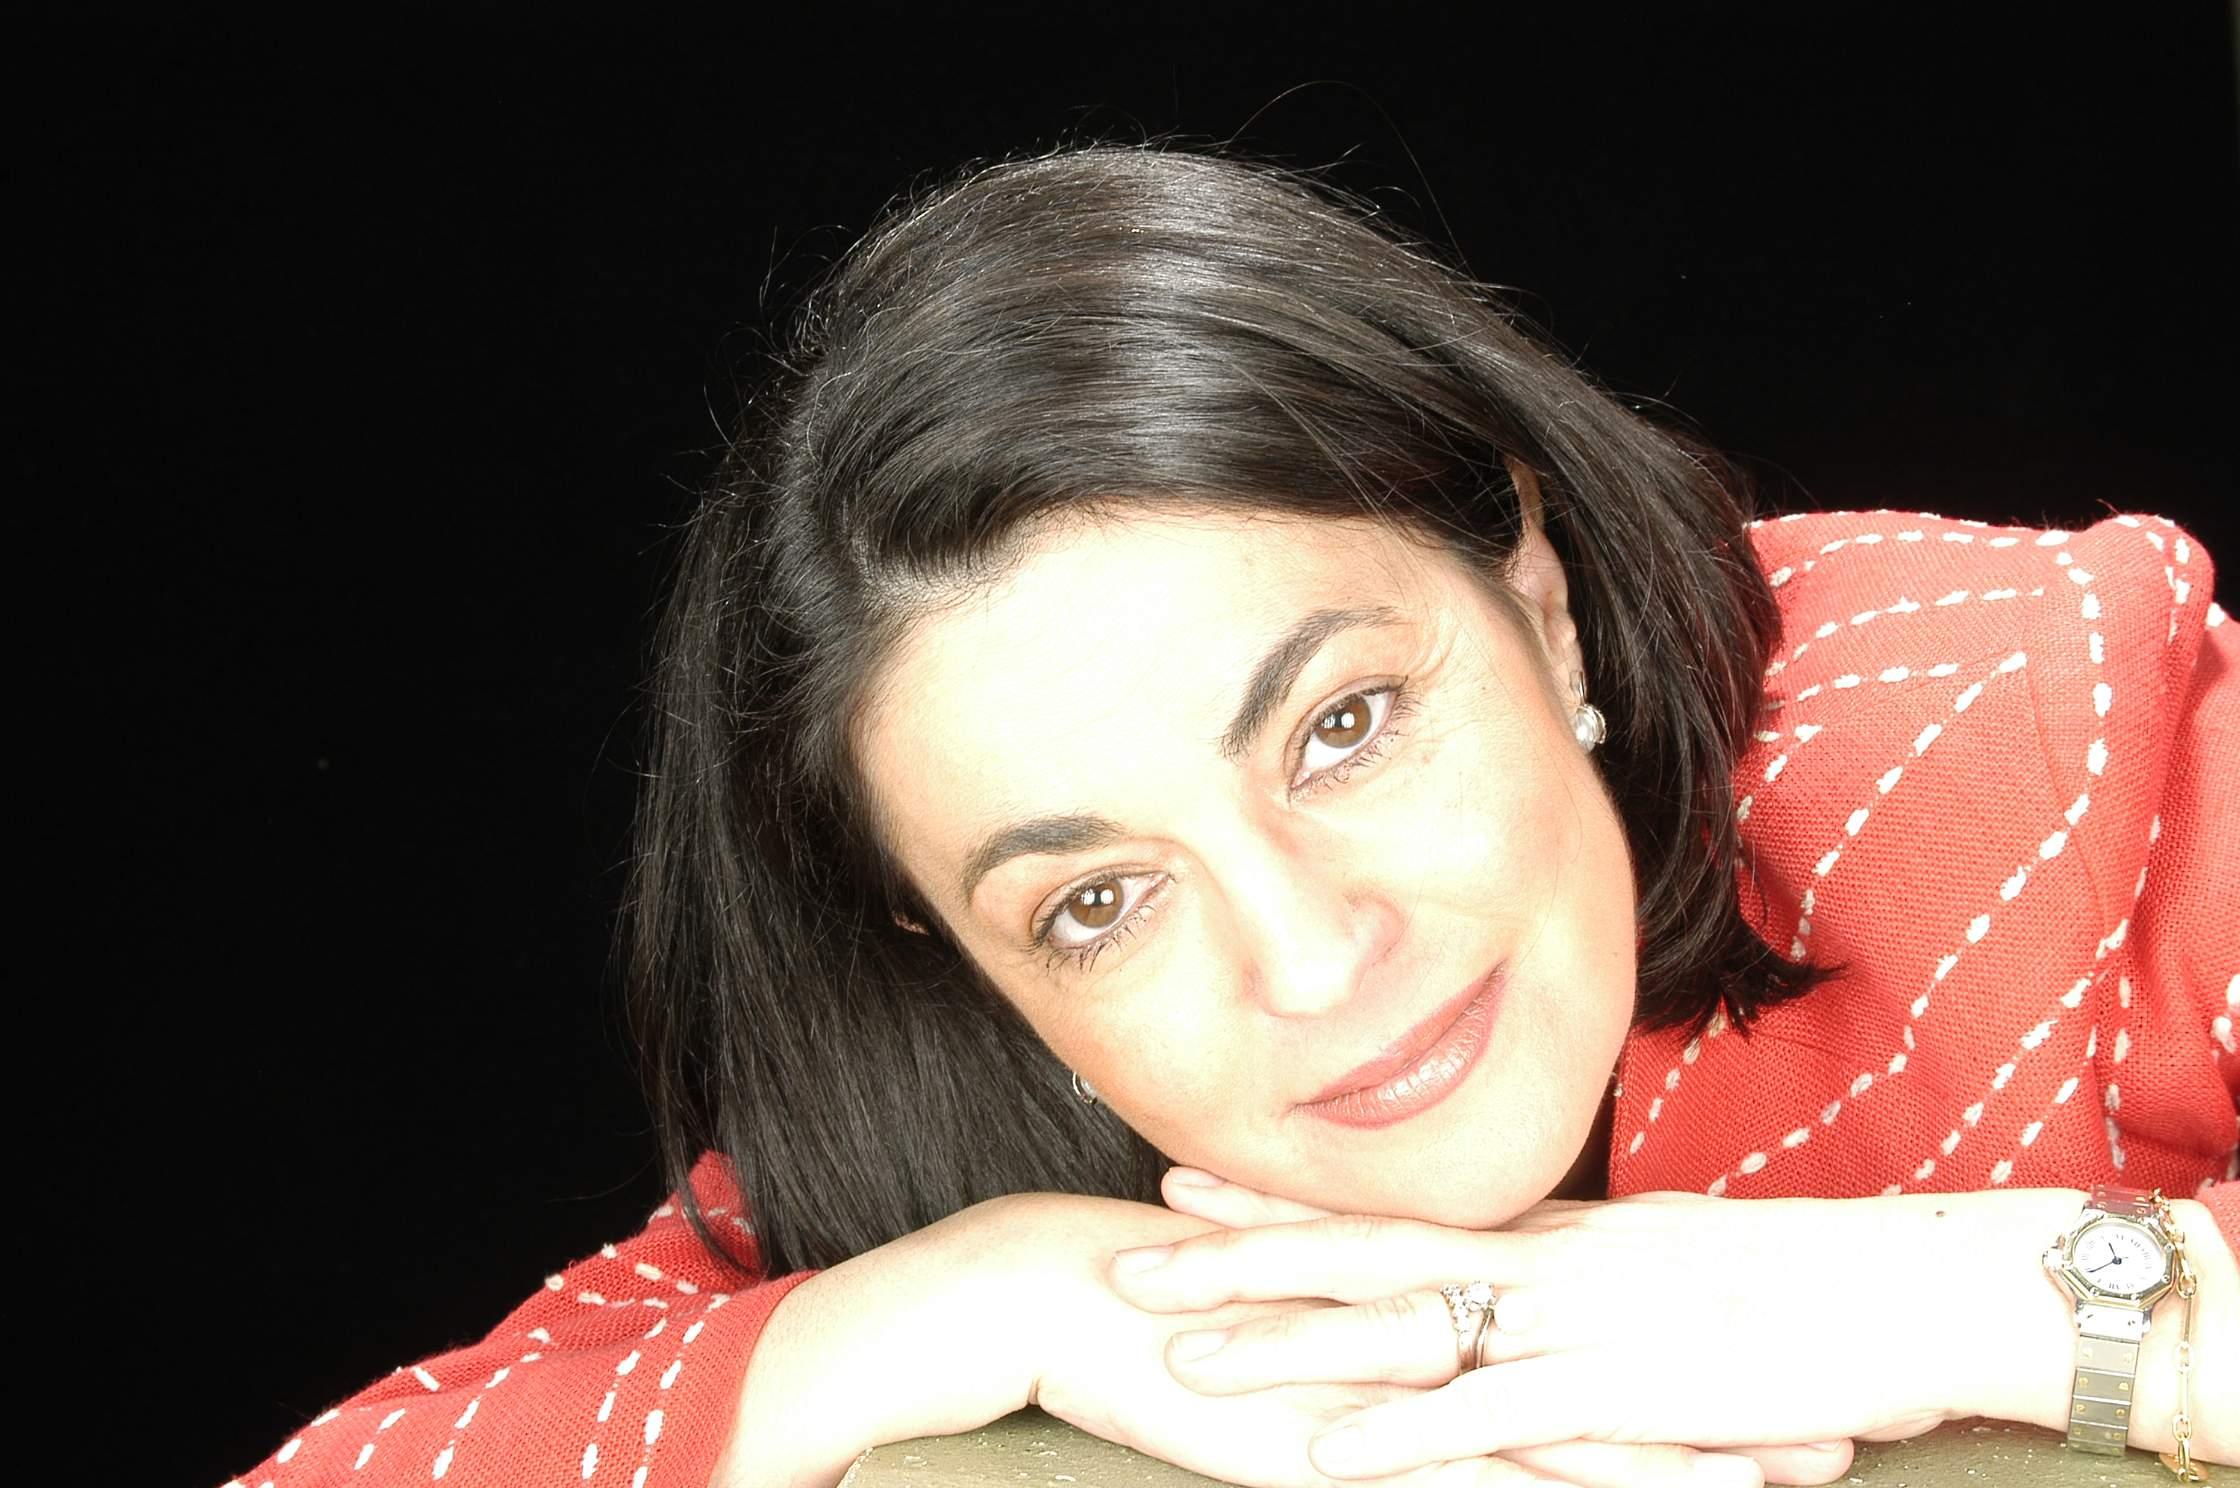 Dra. Aurora Sotelo Vázquez